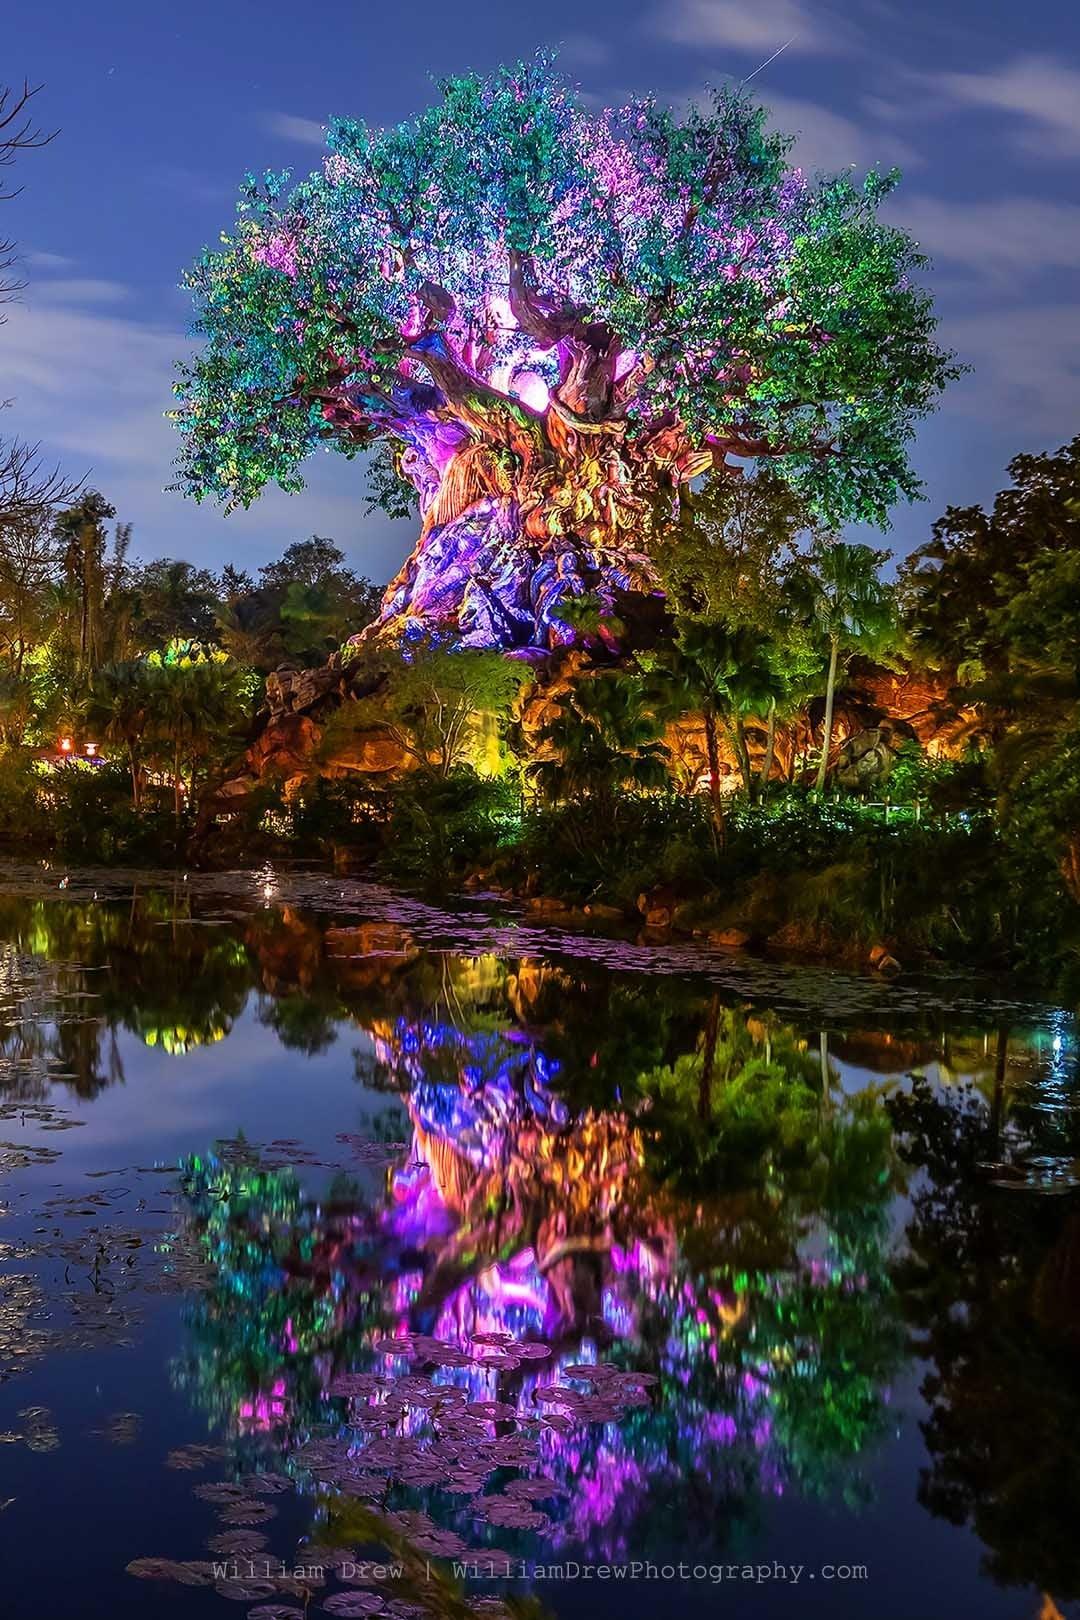 Disney's Tree of Life Reflections 2 - Disney Fine Art Photography Galleries | William Drew Photography